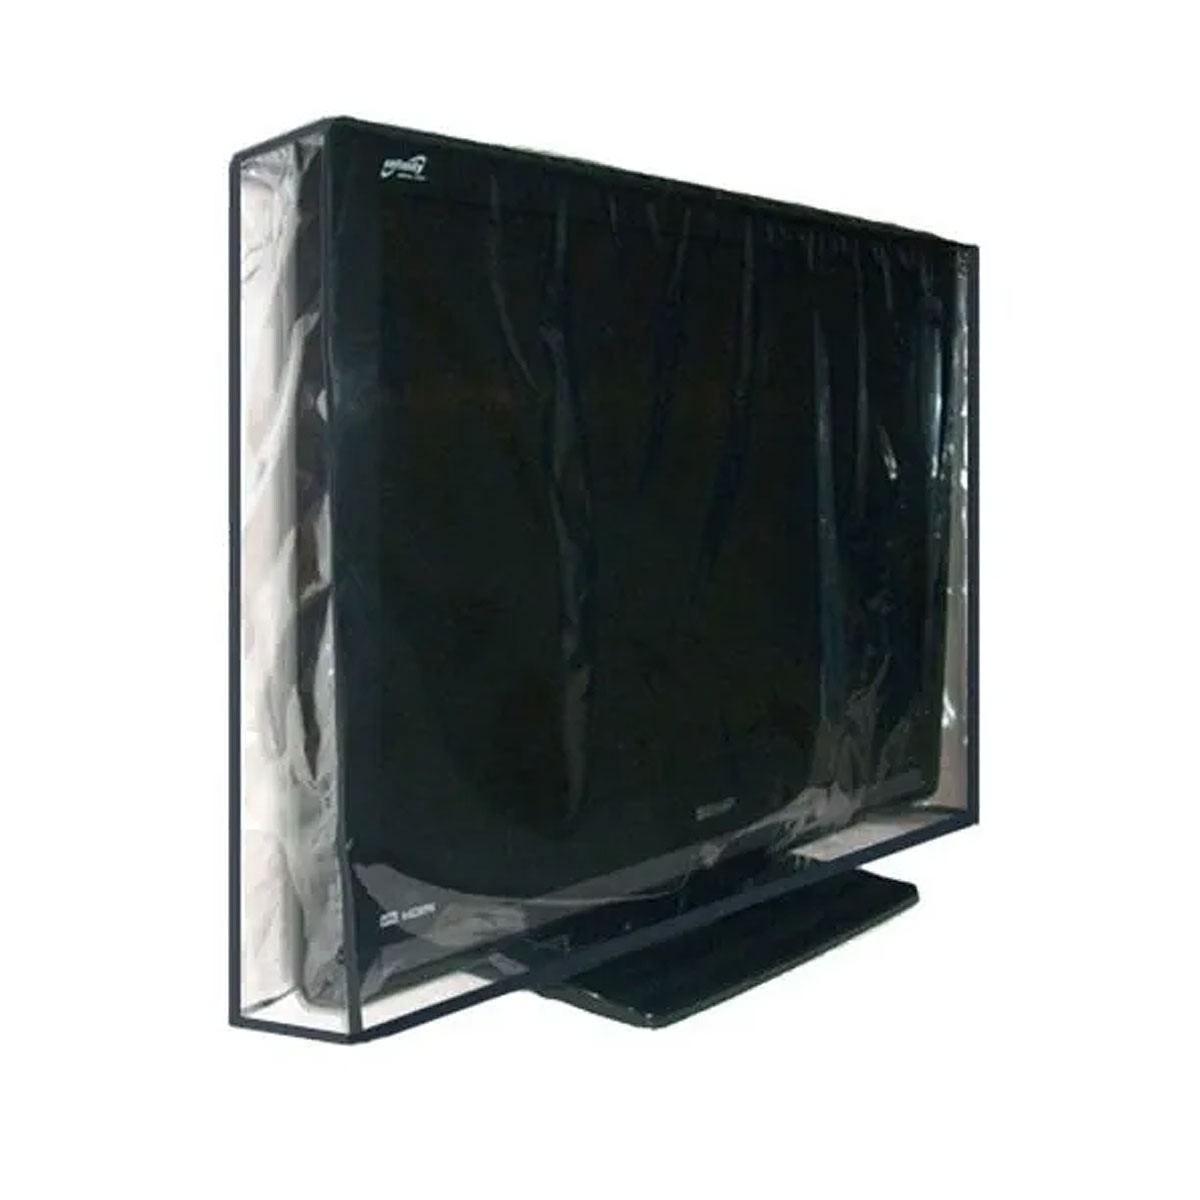 Capa Em Pvc Cristal Para Tv Lcd 26 - Aberta Atrás